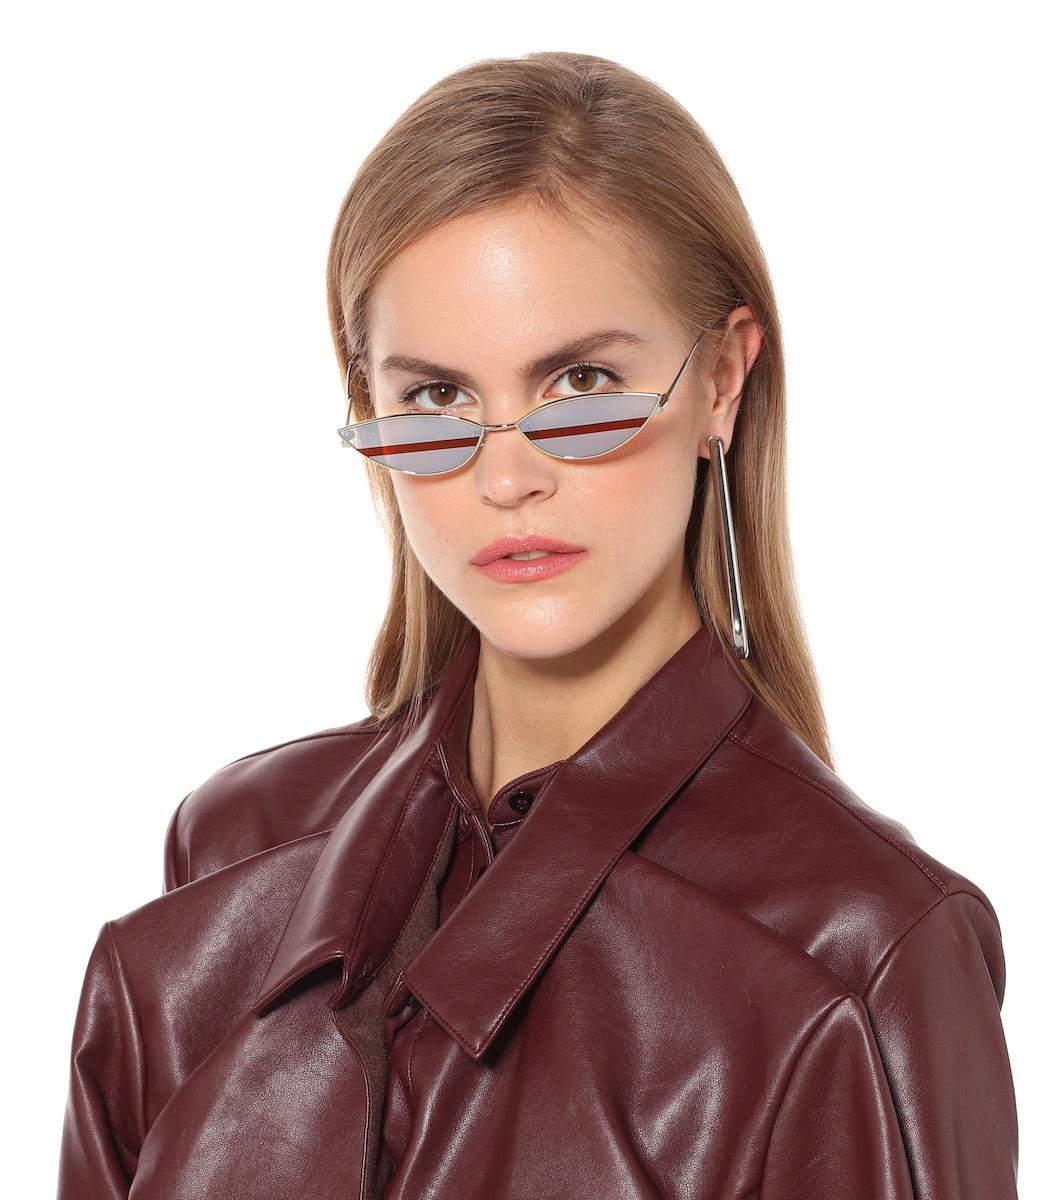 d40e1bf111fec Poxi 02 Sunglasses - Gentle Monster